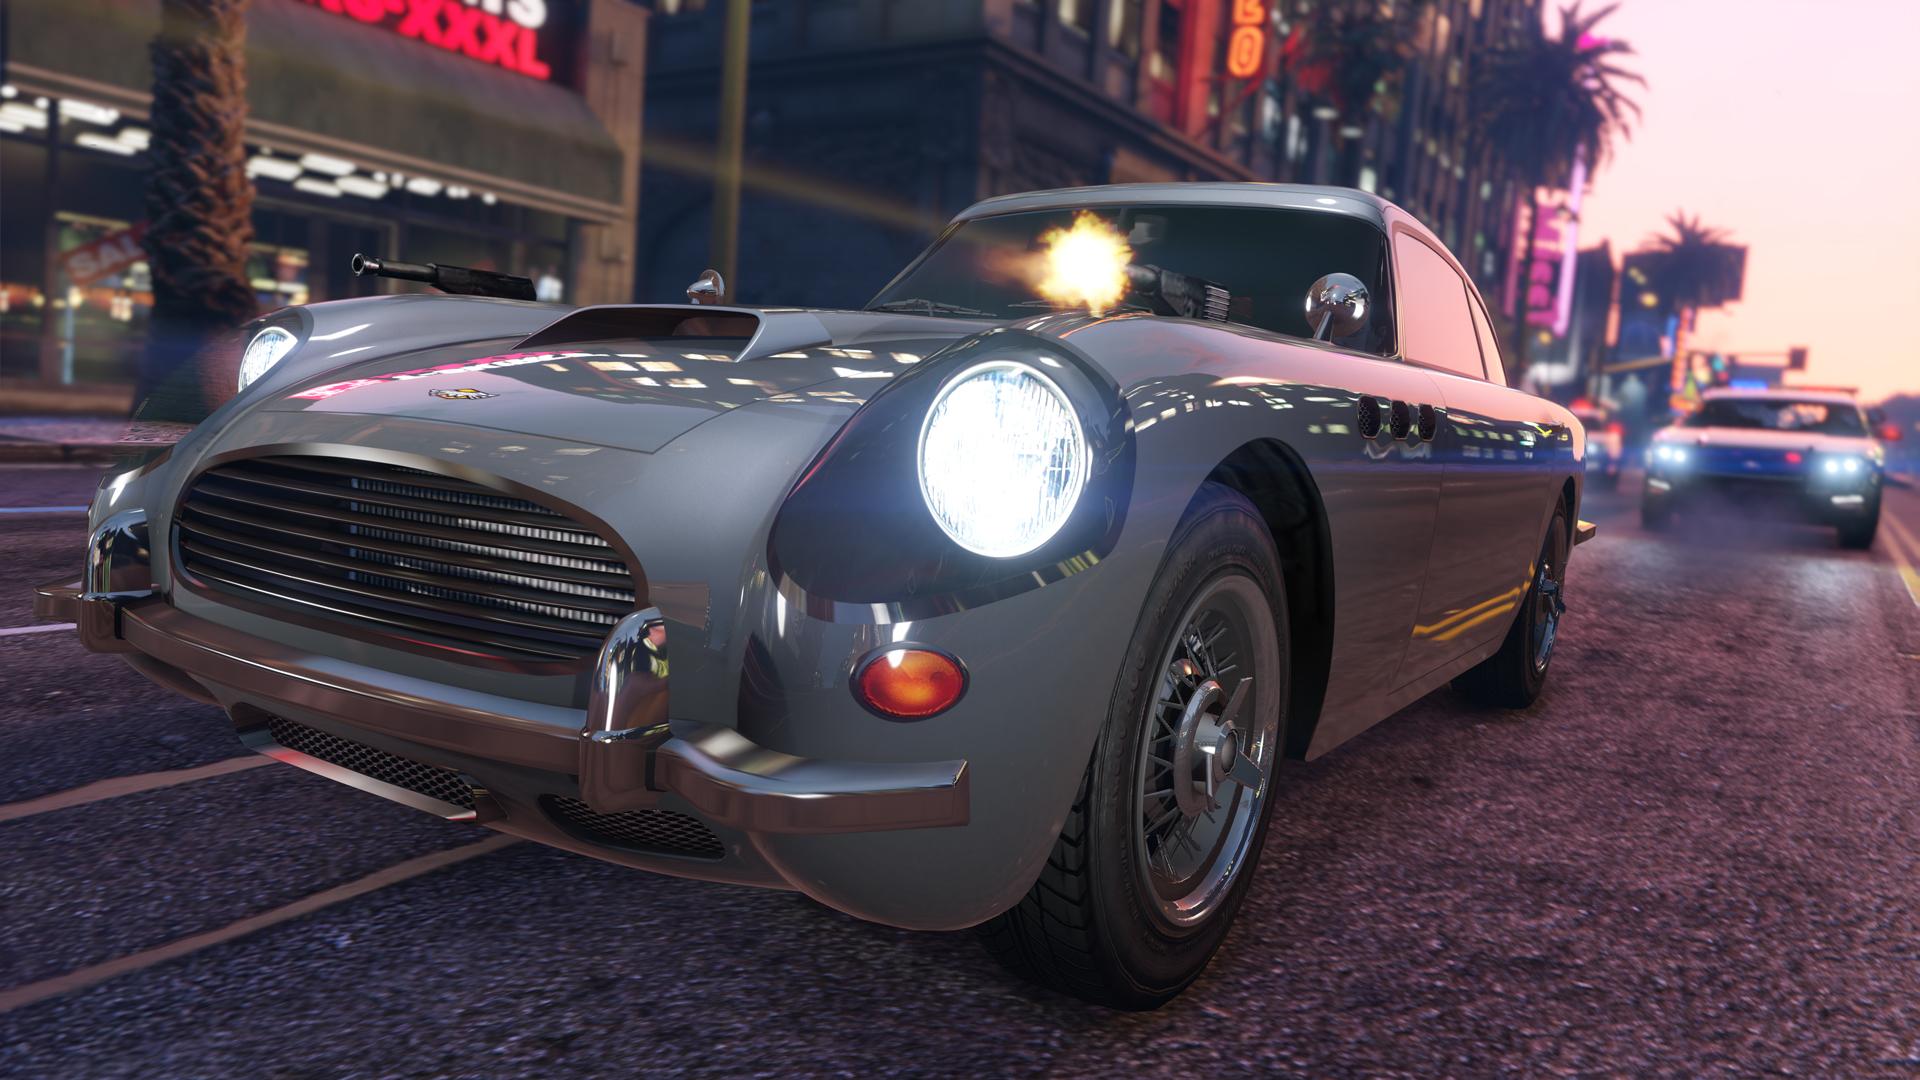 Dewbauchee JB 700W Image officielle GTA Online.jpg